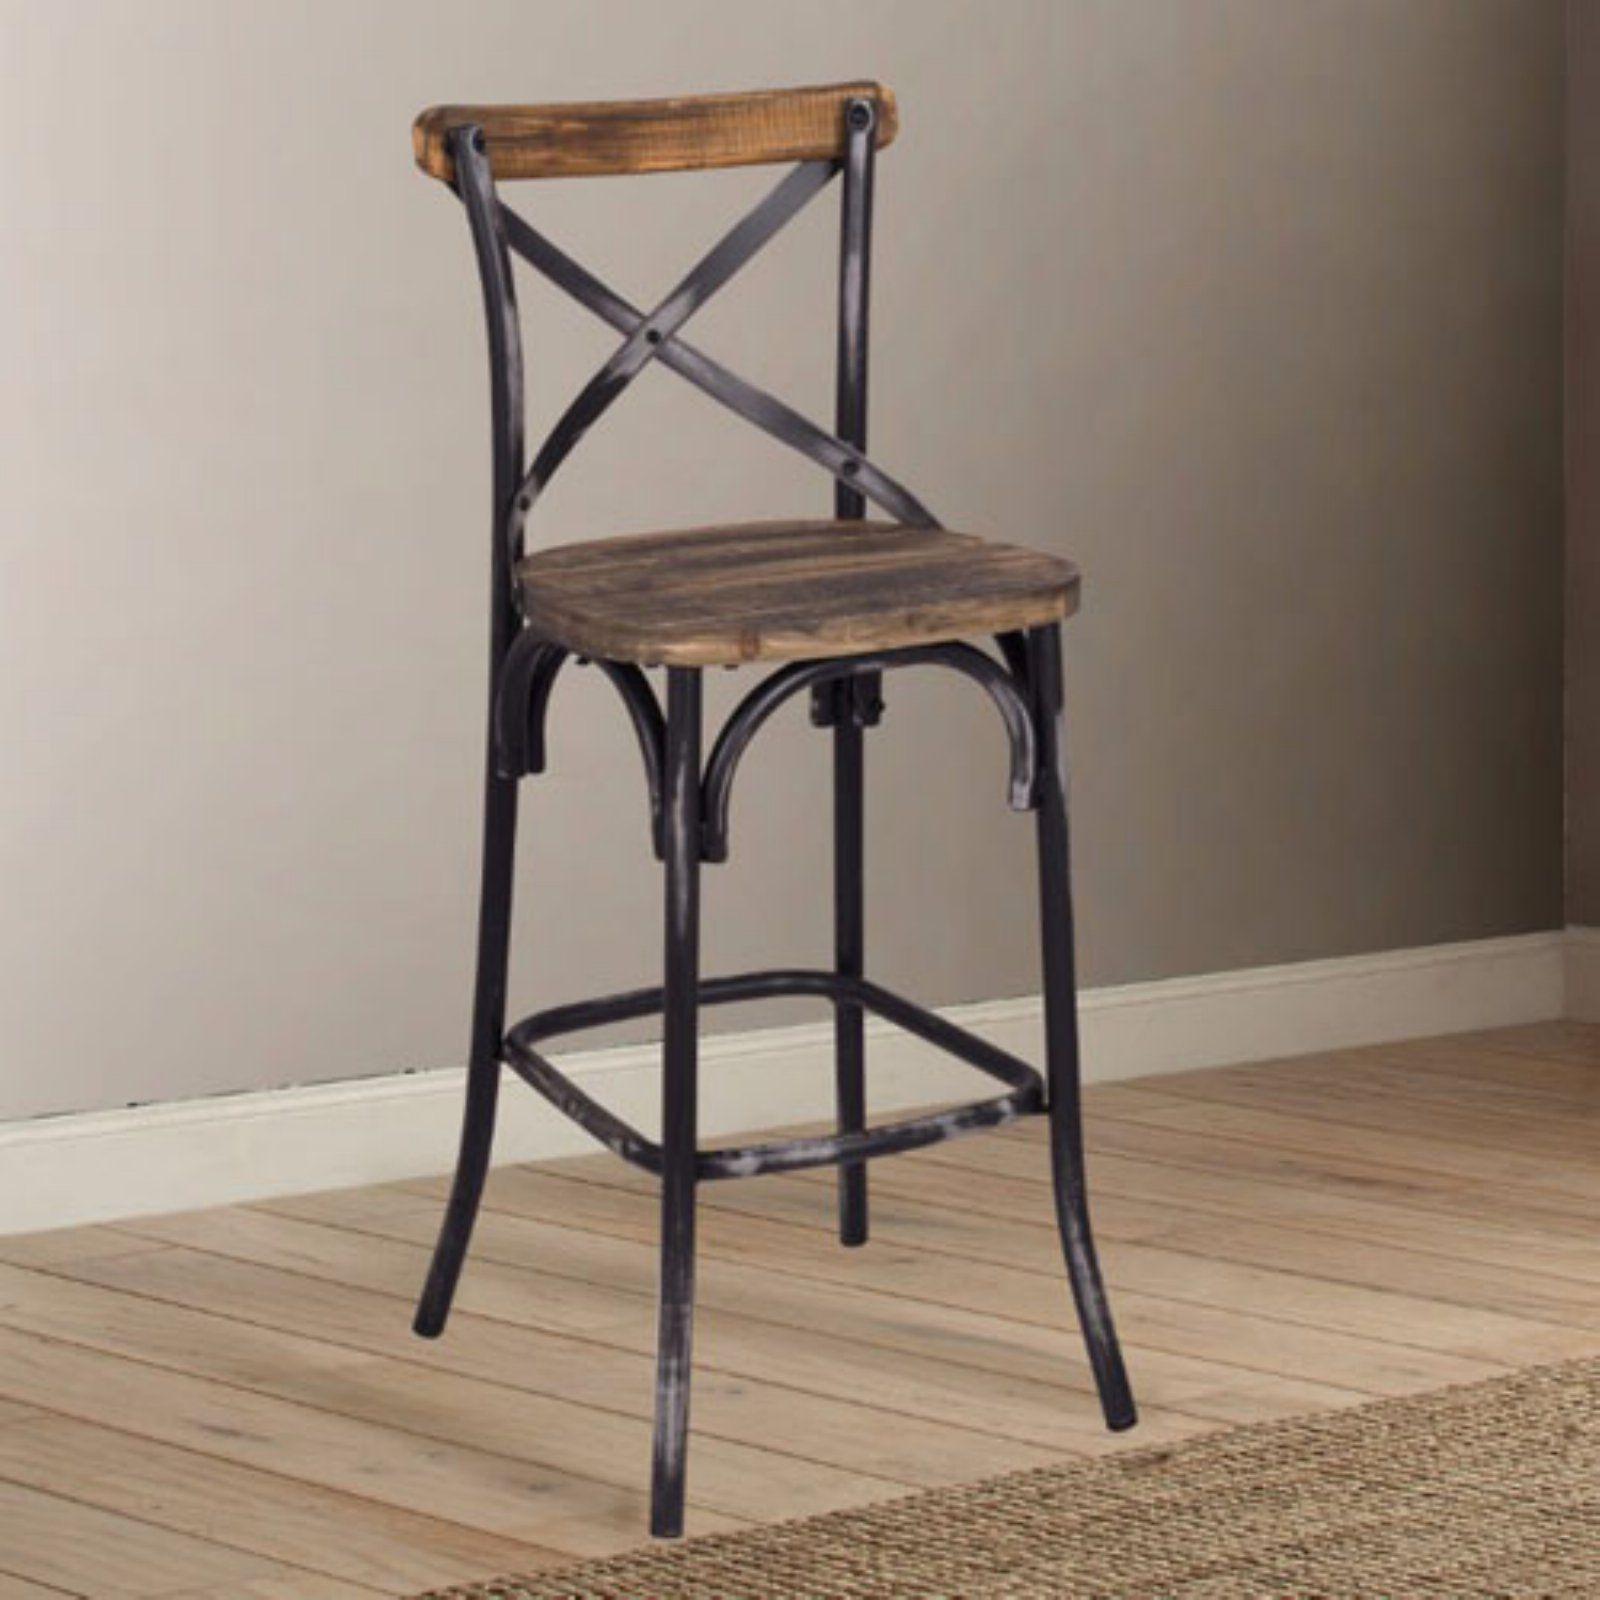 Swell Benzara Rustic 29 In Cross Back Bar Stool Black In 2019 Spiritservingveterans Wood Chair Design Ideas Spiritservingveteransorg